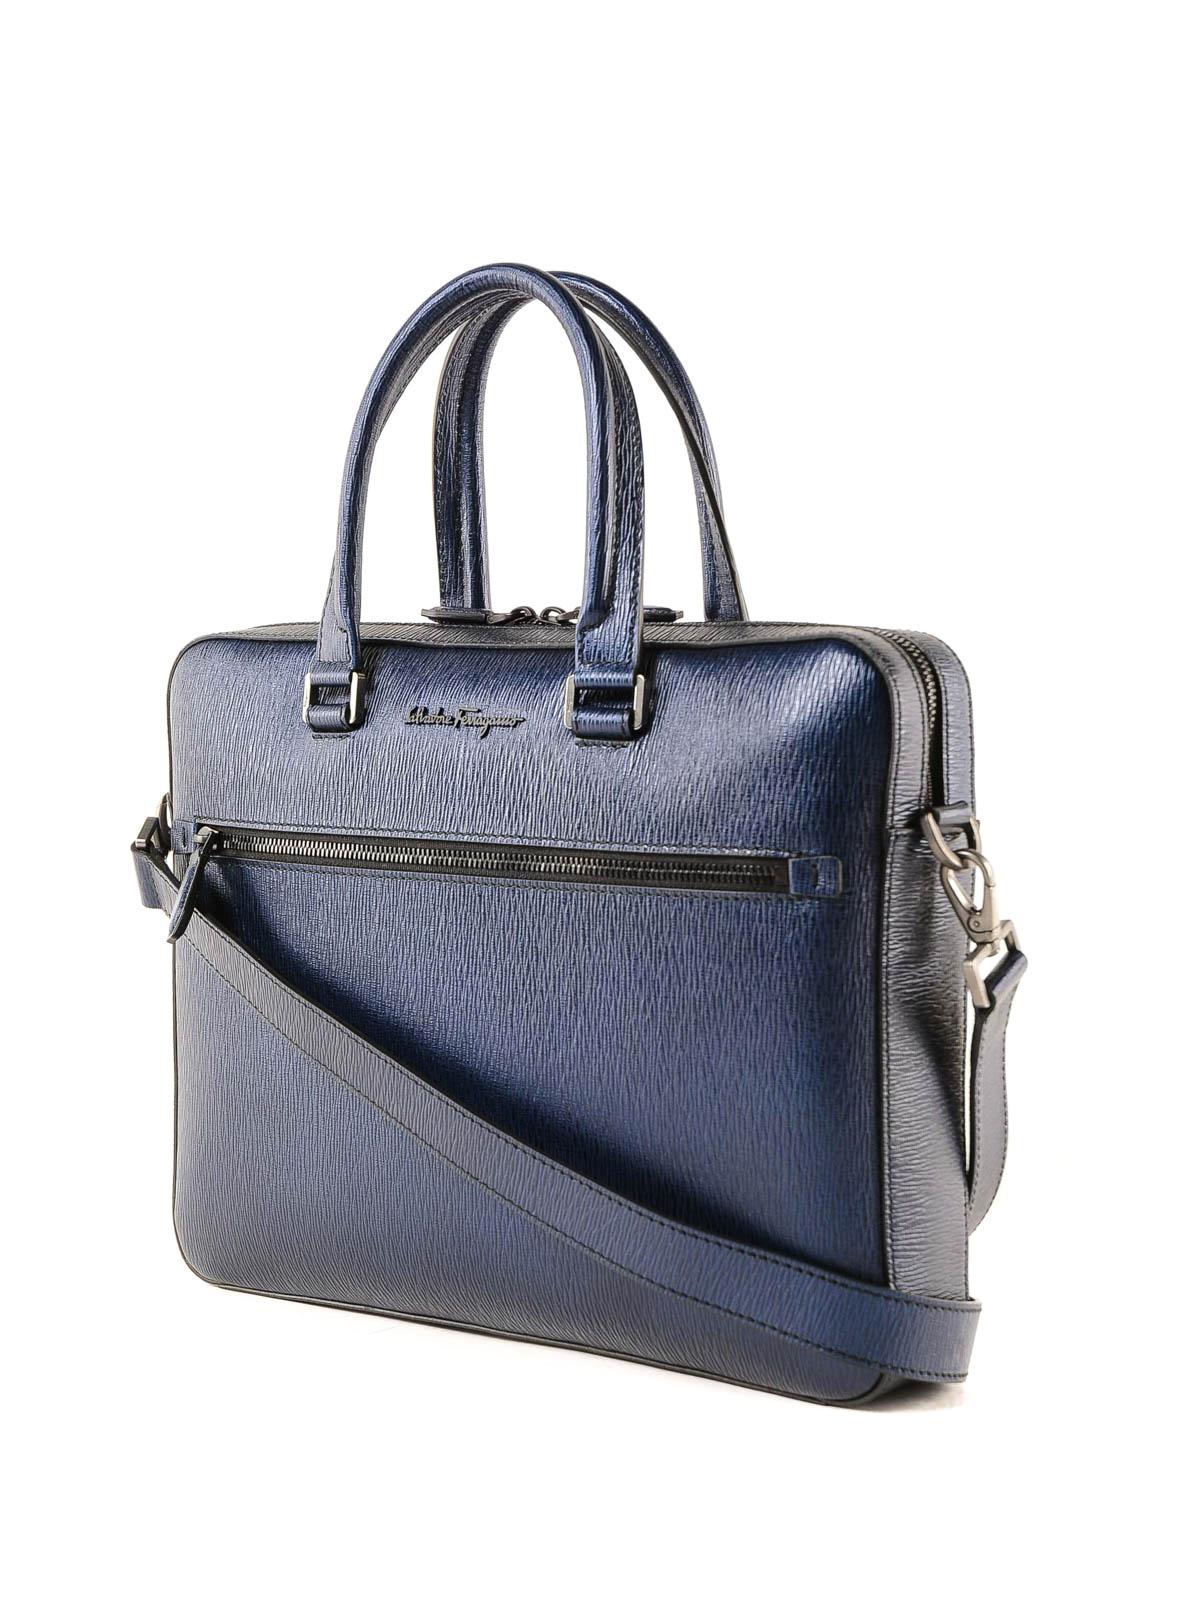 f2f060ead6f3 SALVATORE FERRAGAMO  Luggage   Travel bags online - Navy blue leather  briefcase